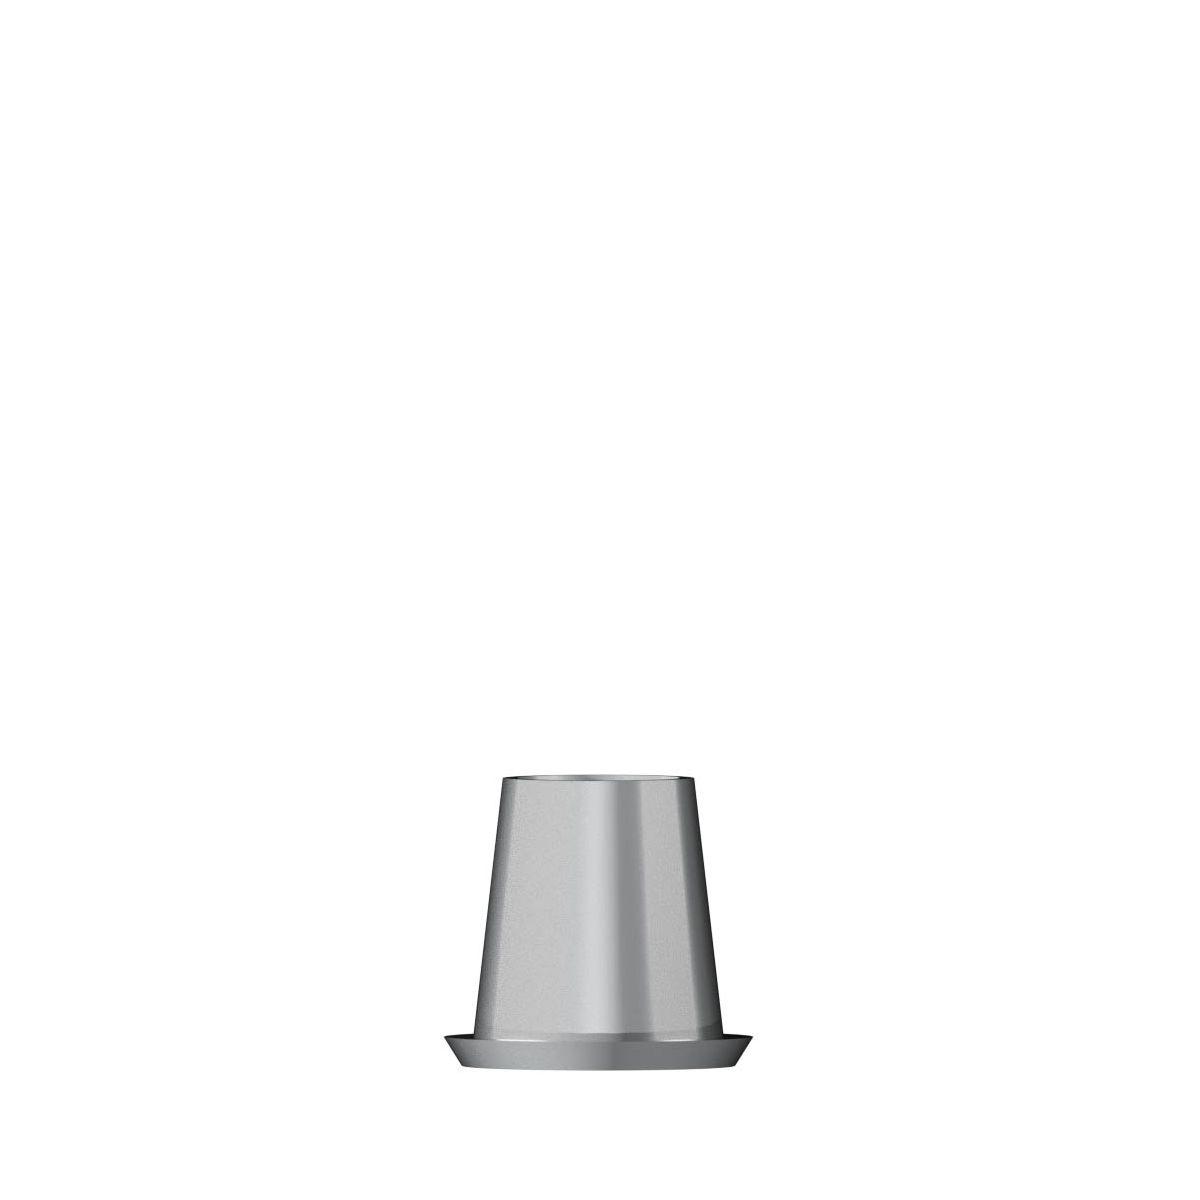 Titanbasis inkl. Brückenschraube (S-Serie)